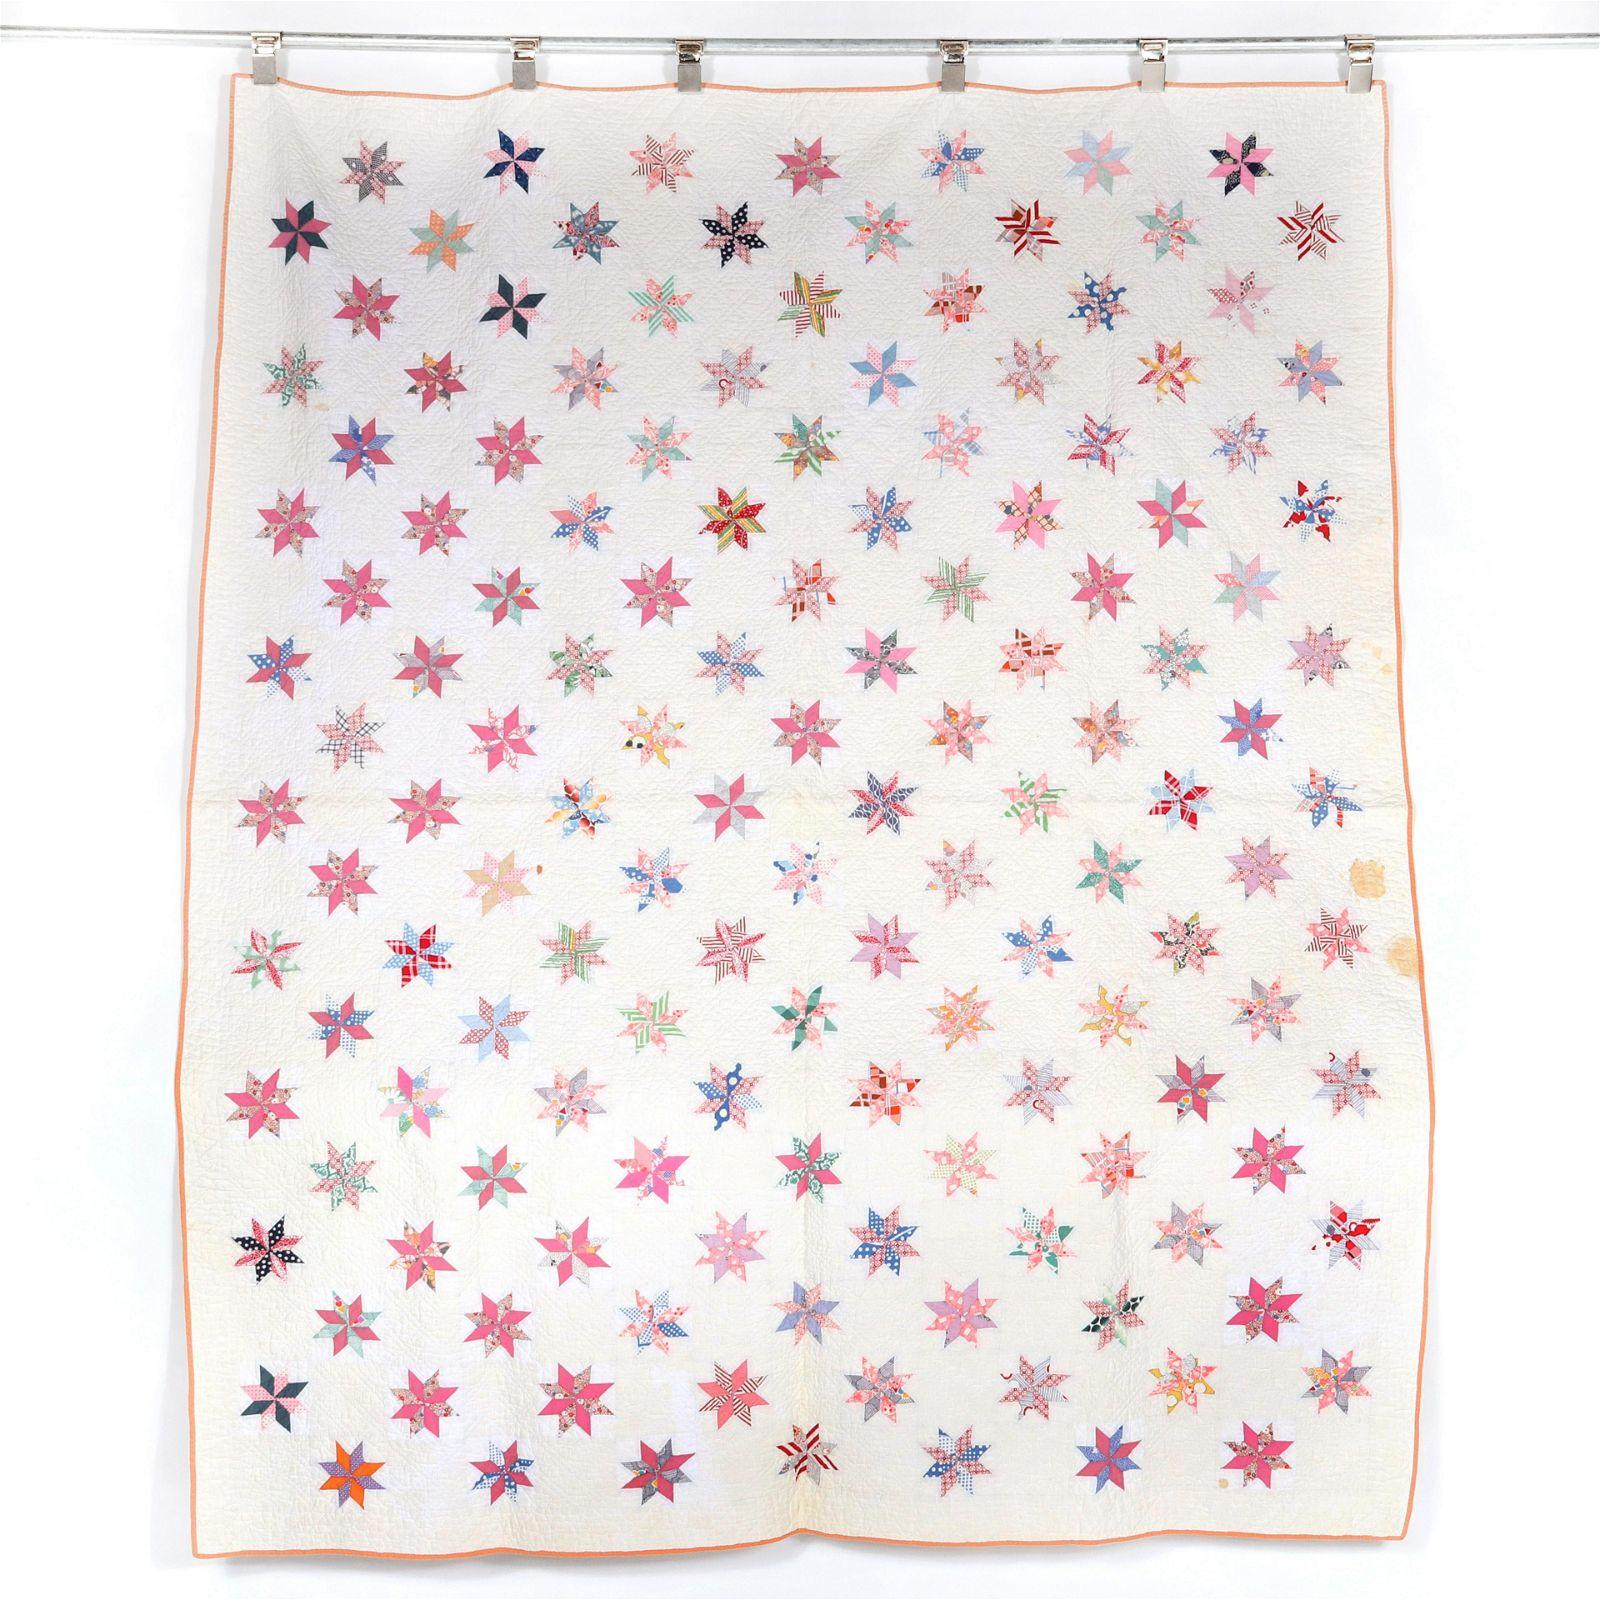 Vintage handmade 1930's floating stars quilt